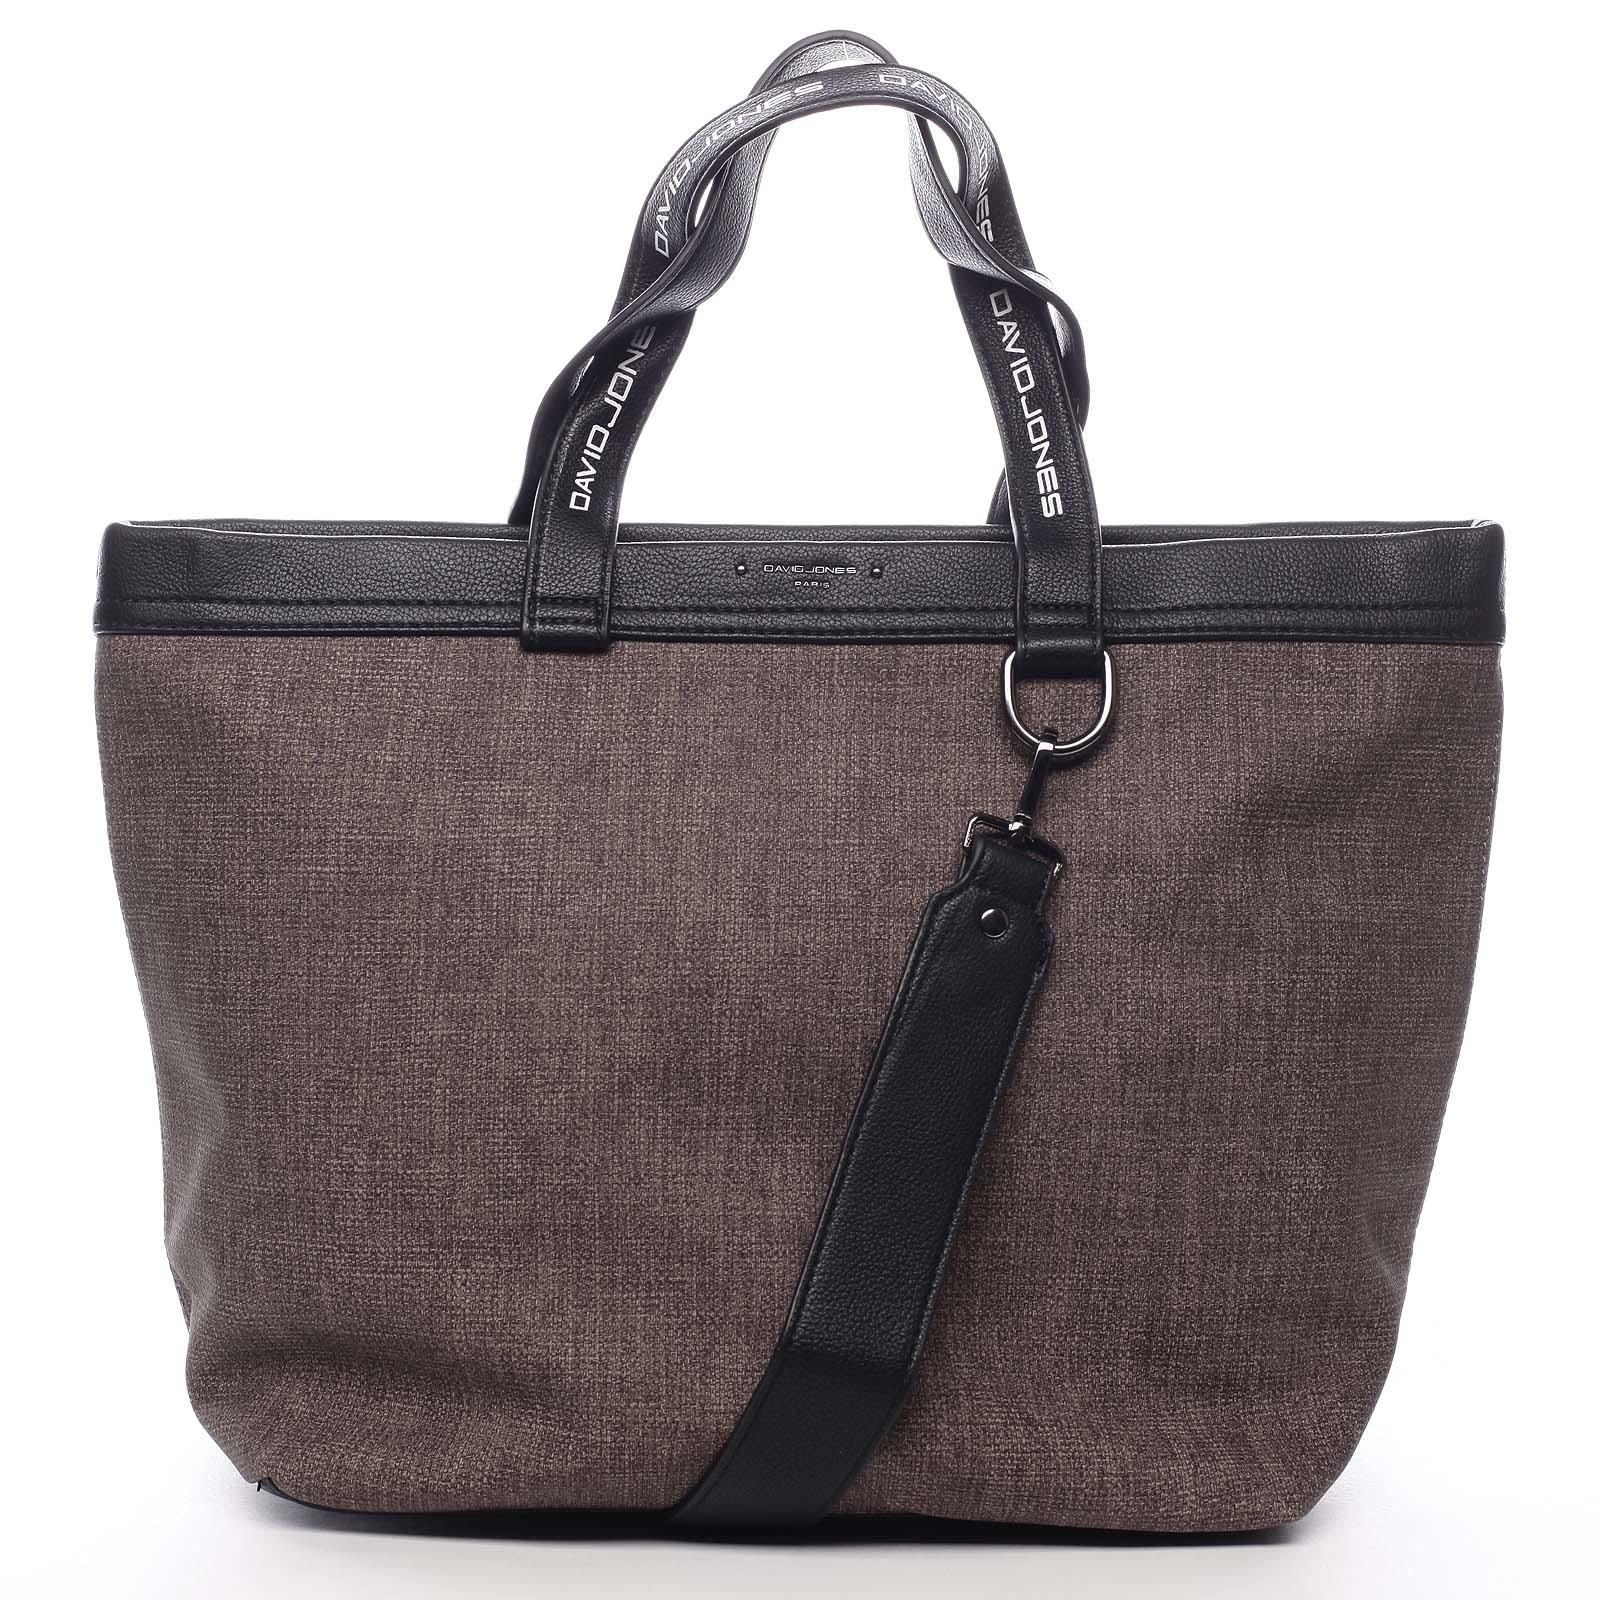 Veľká dámska kabelka hnedá - David Jones Graciete